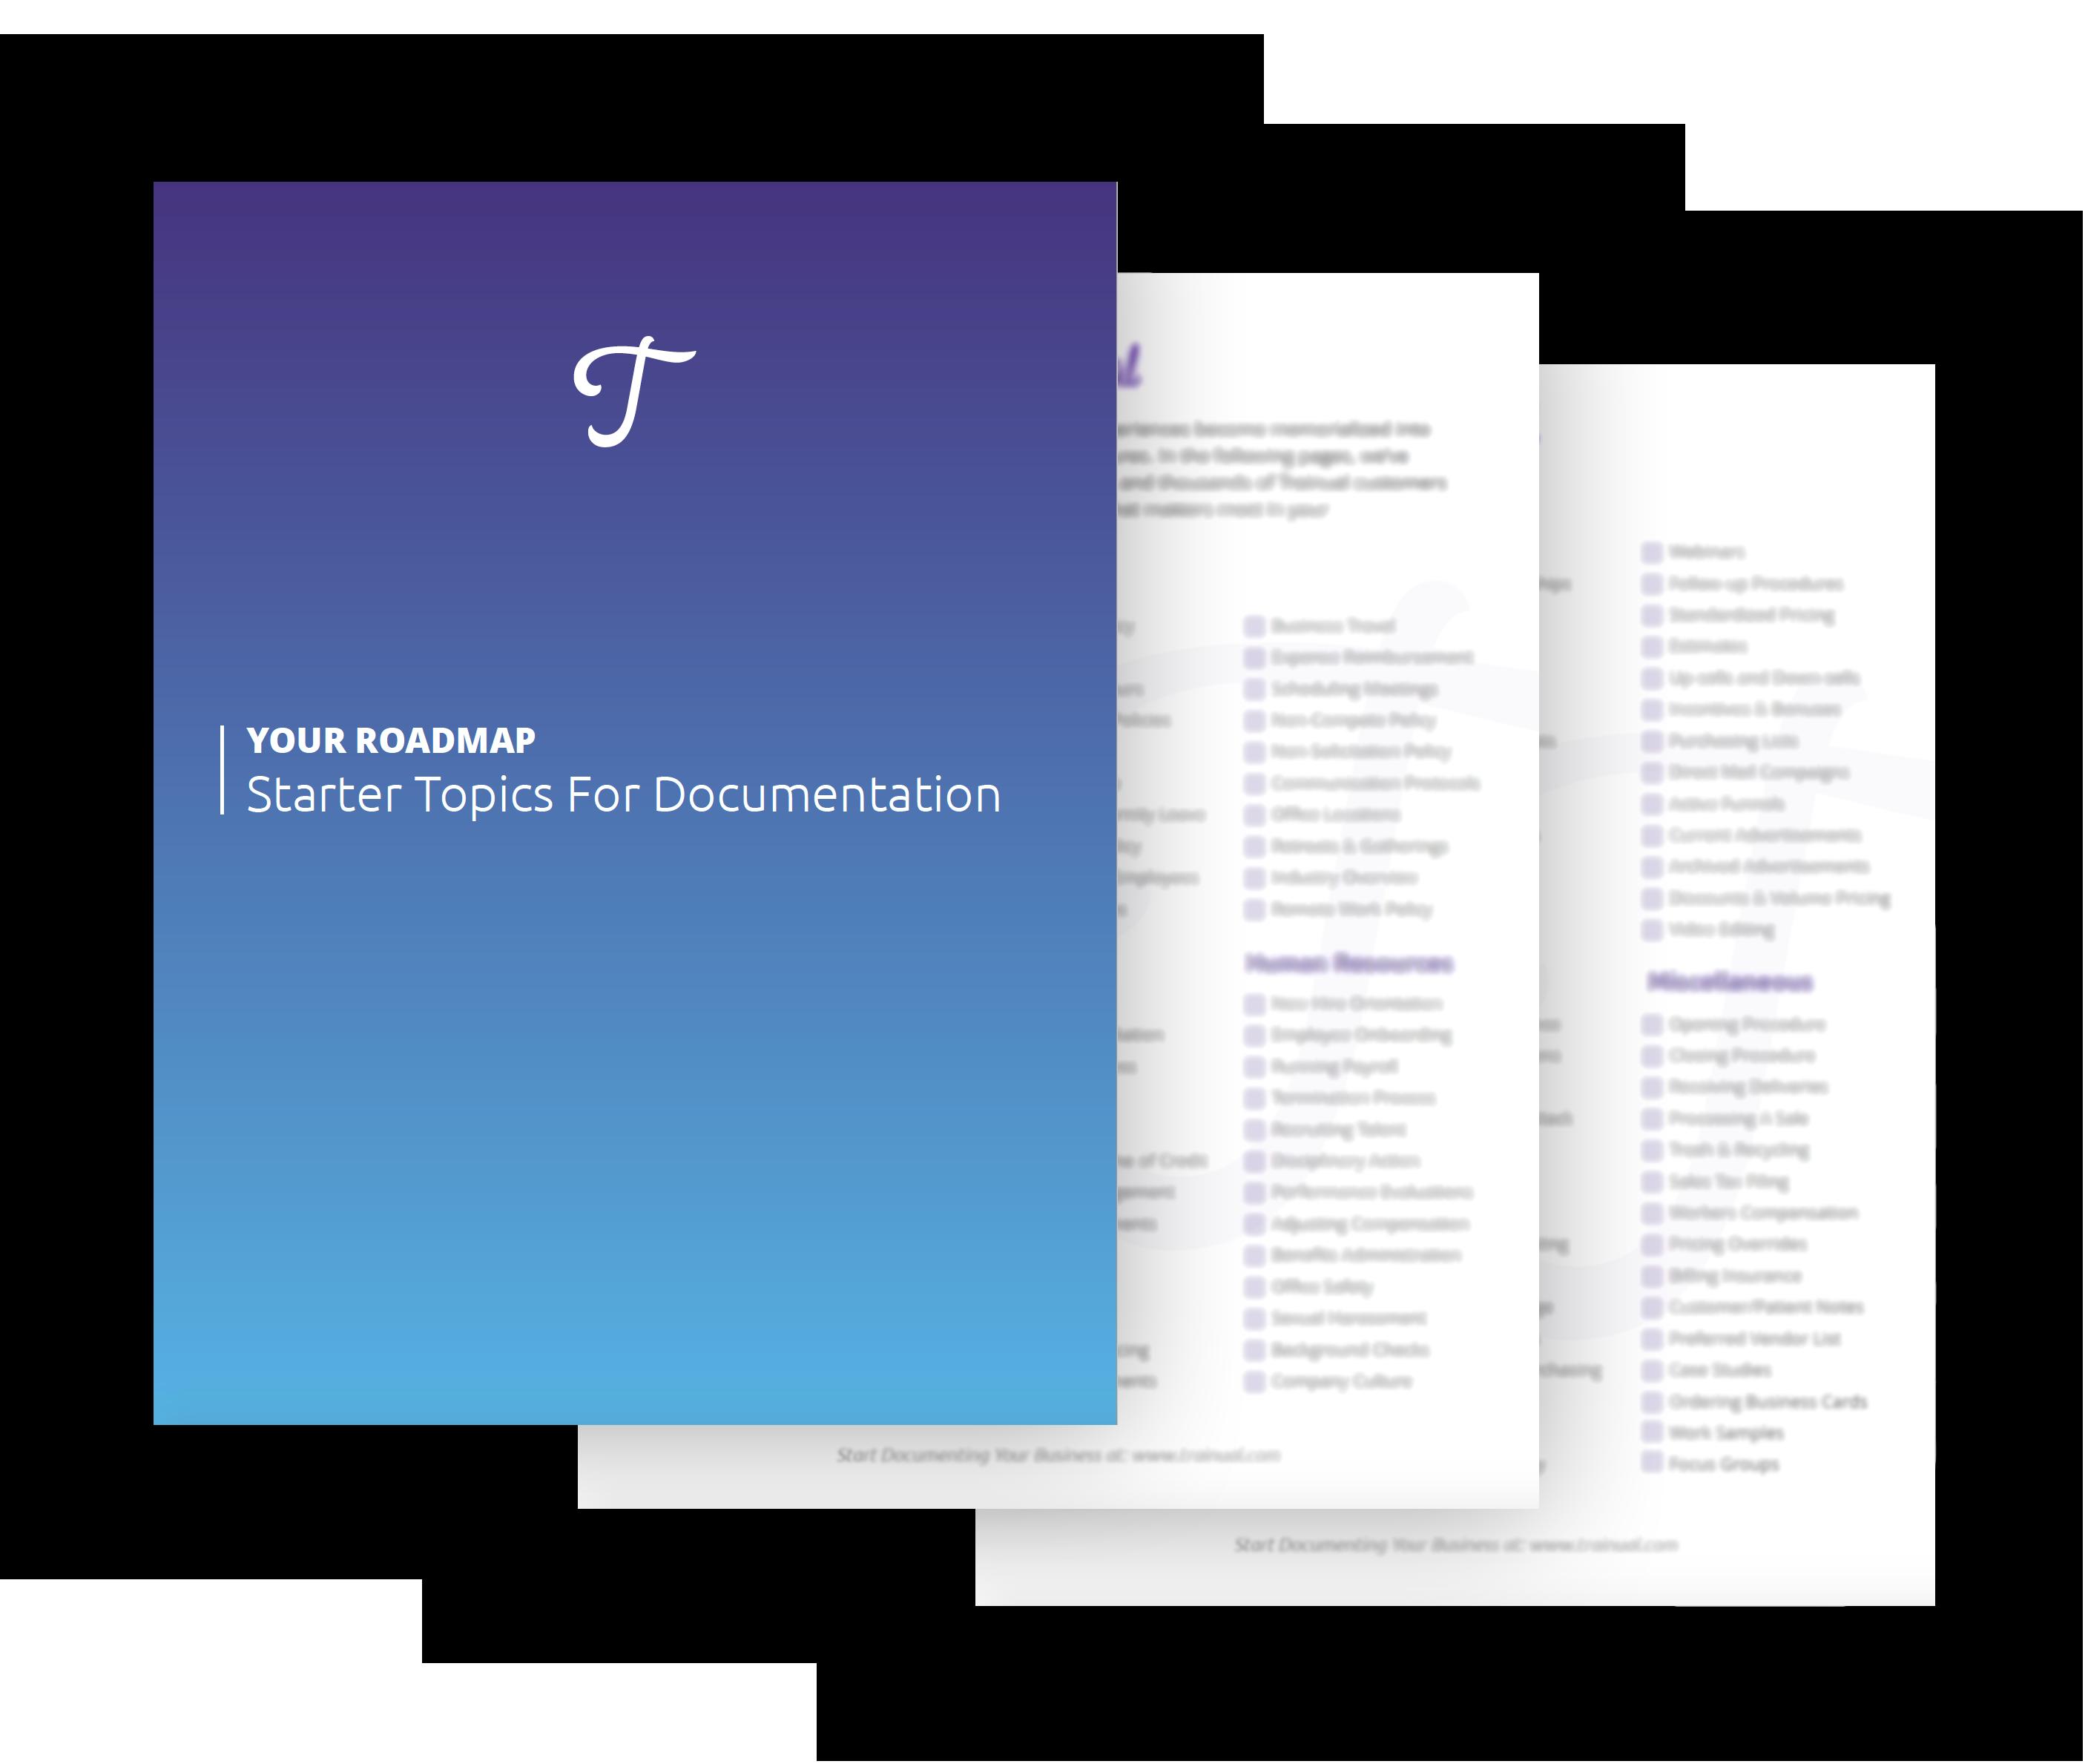 trainual-topics-download-image